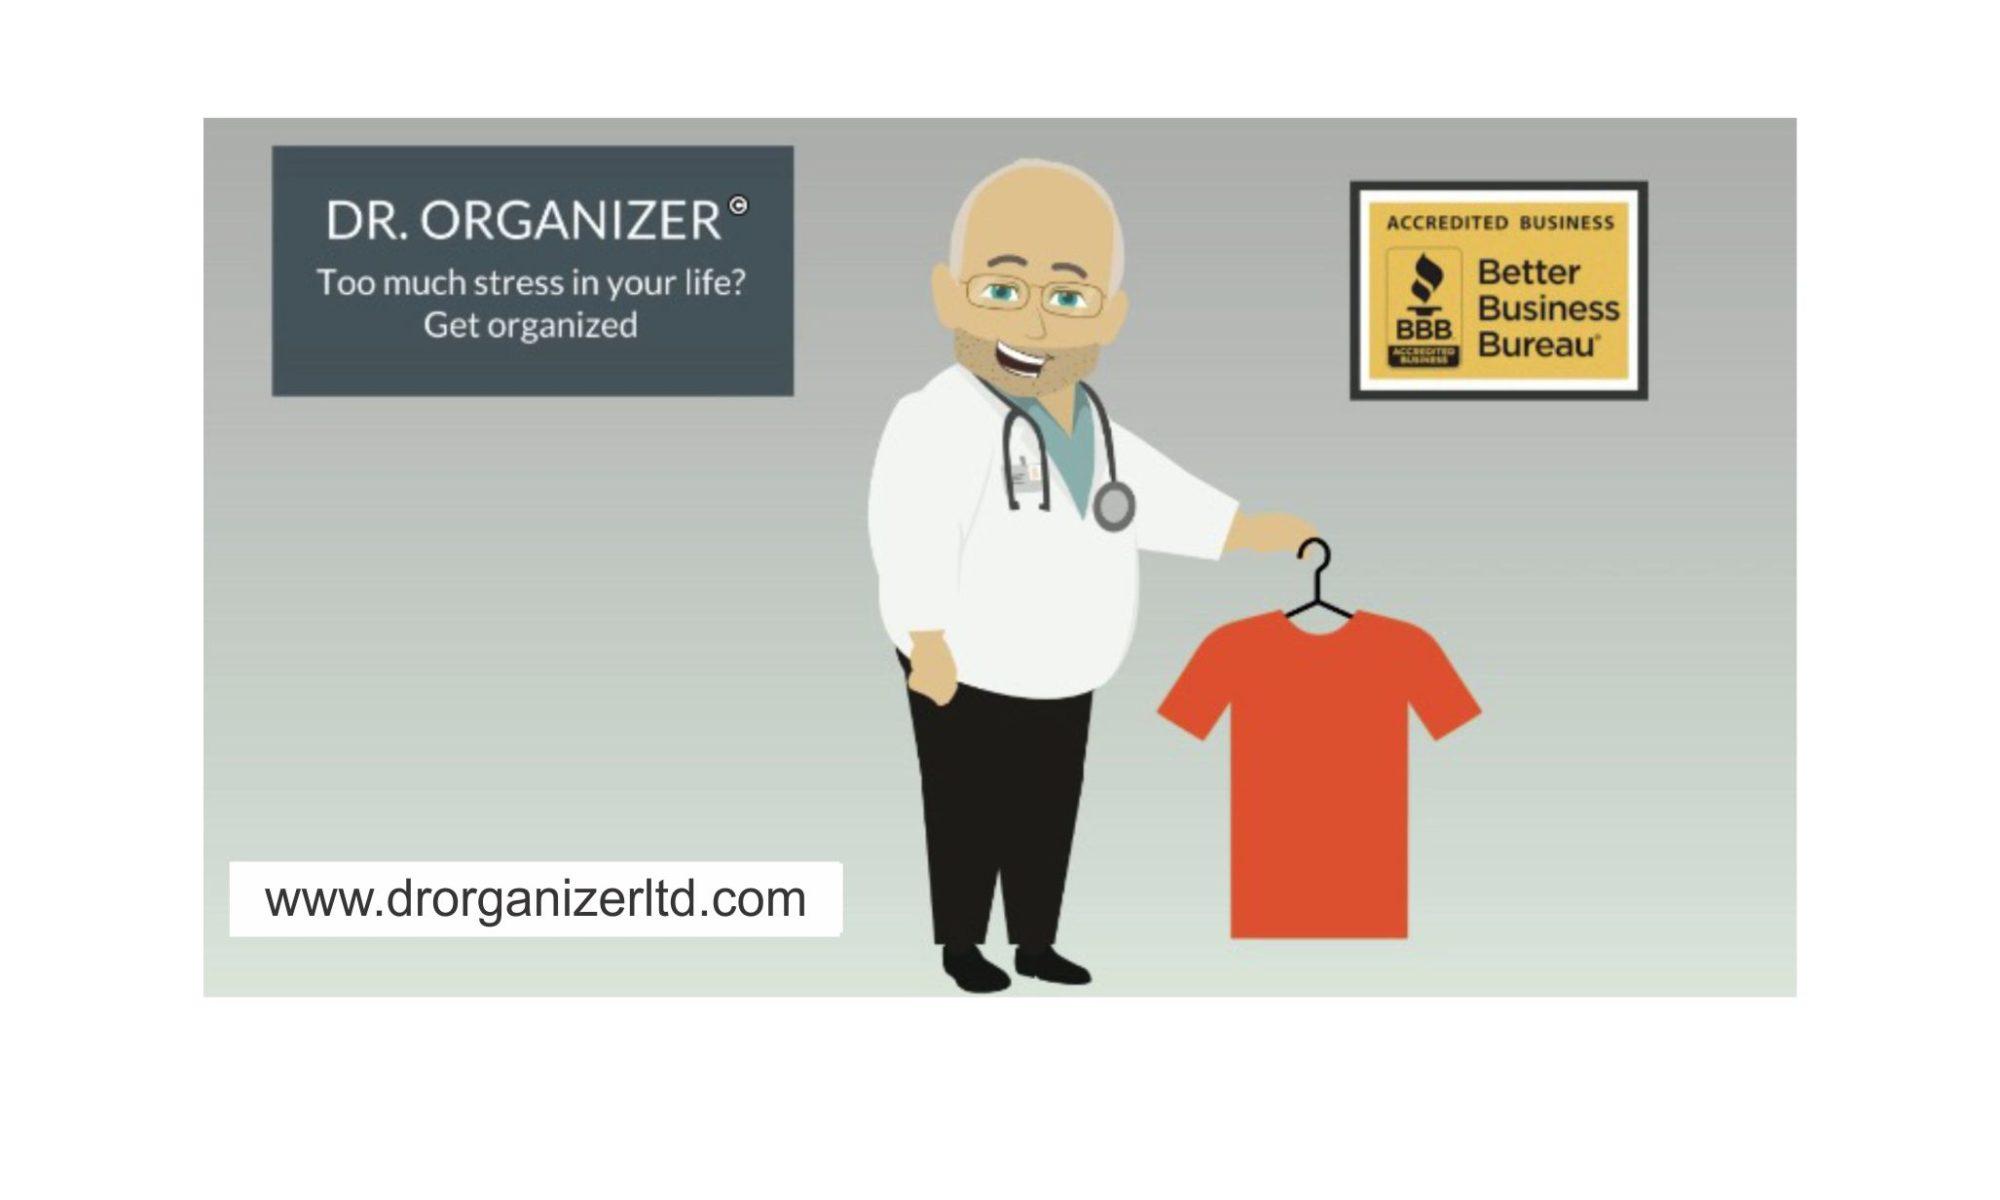 drorganizerltd.com